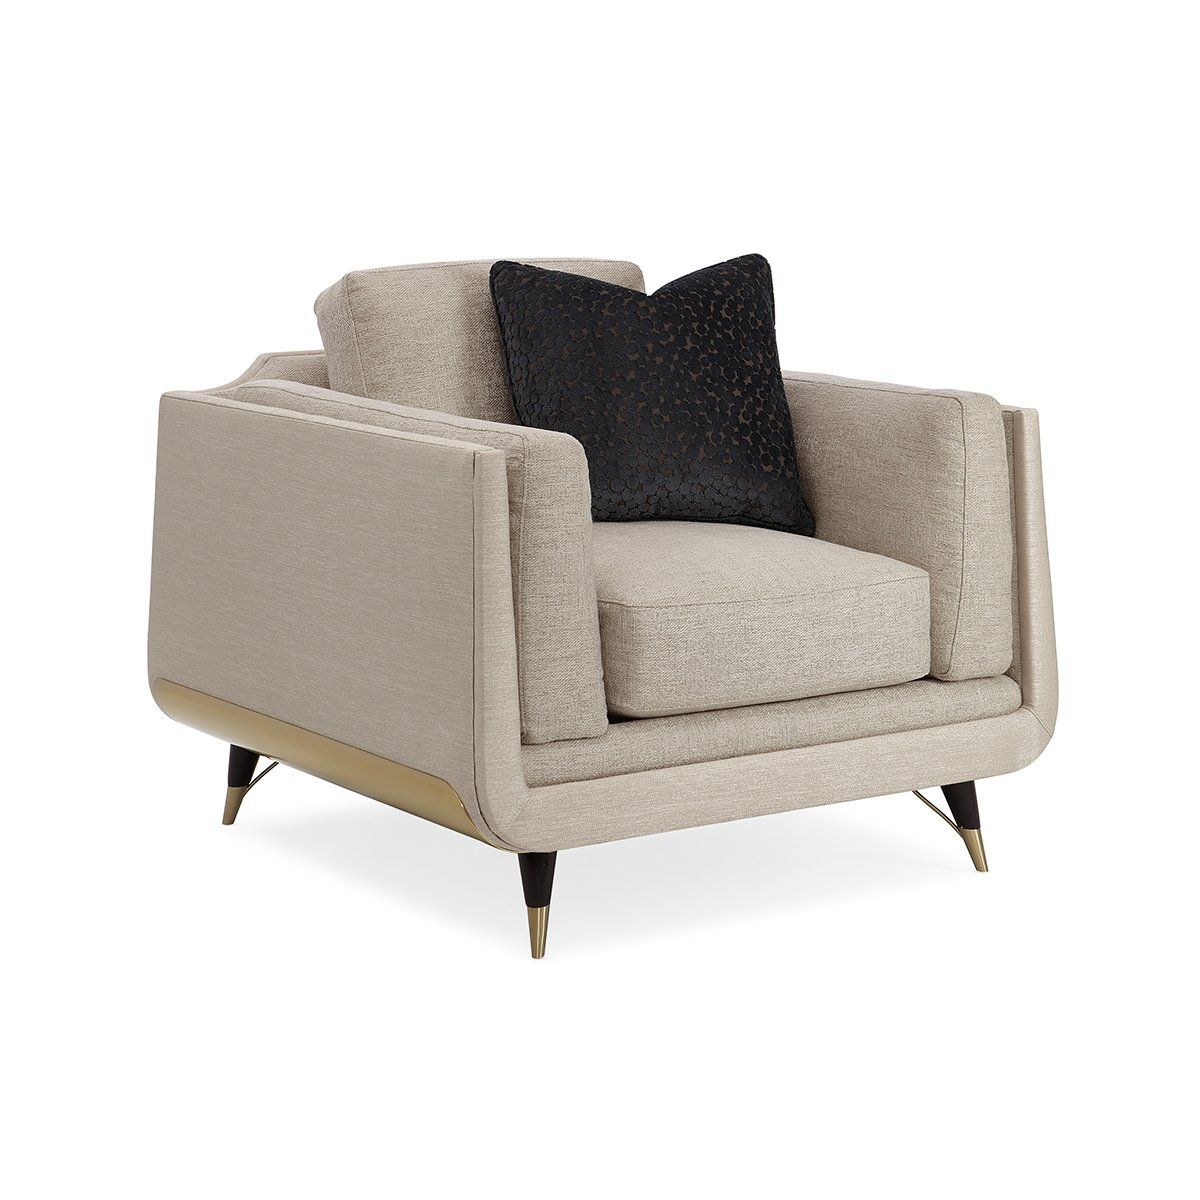 Chicago Occasional Chair Furniture Office Furniture Design All Modern Furniture